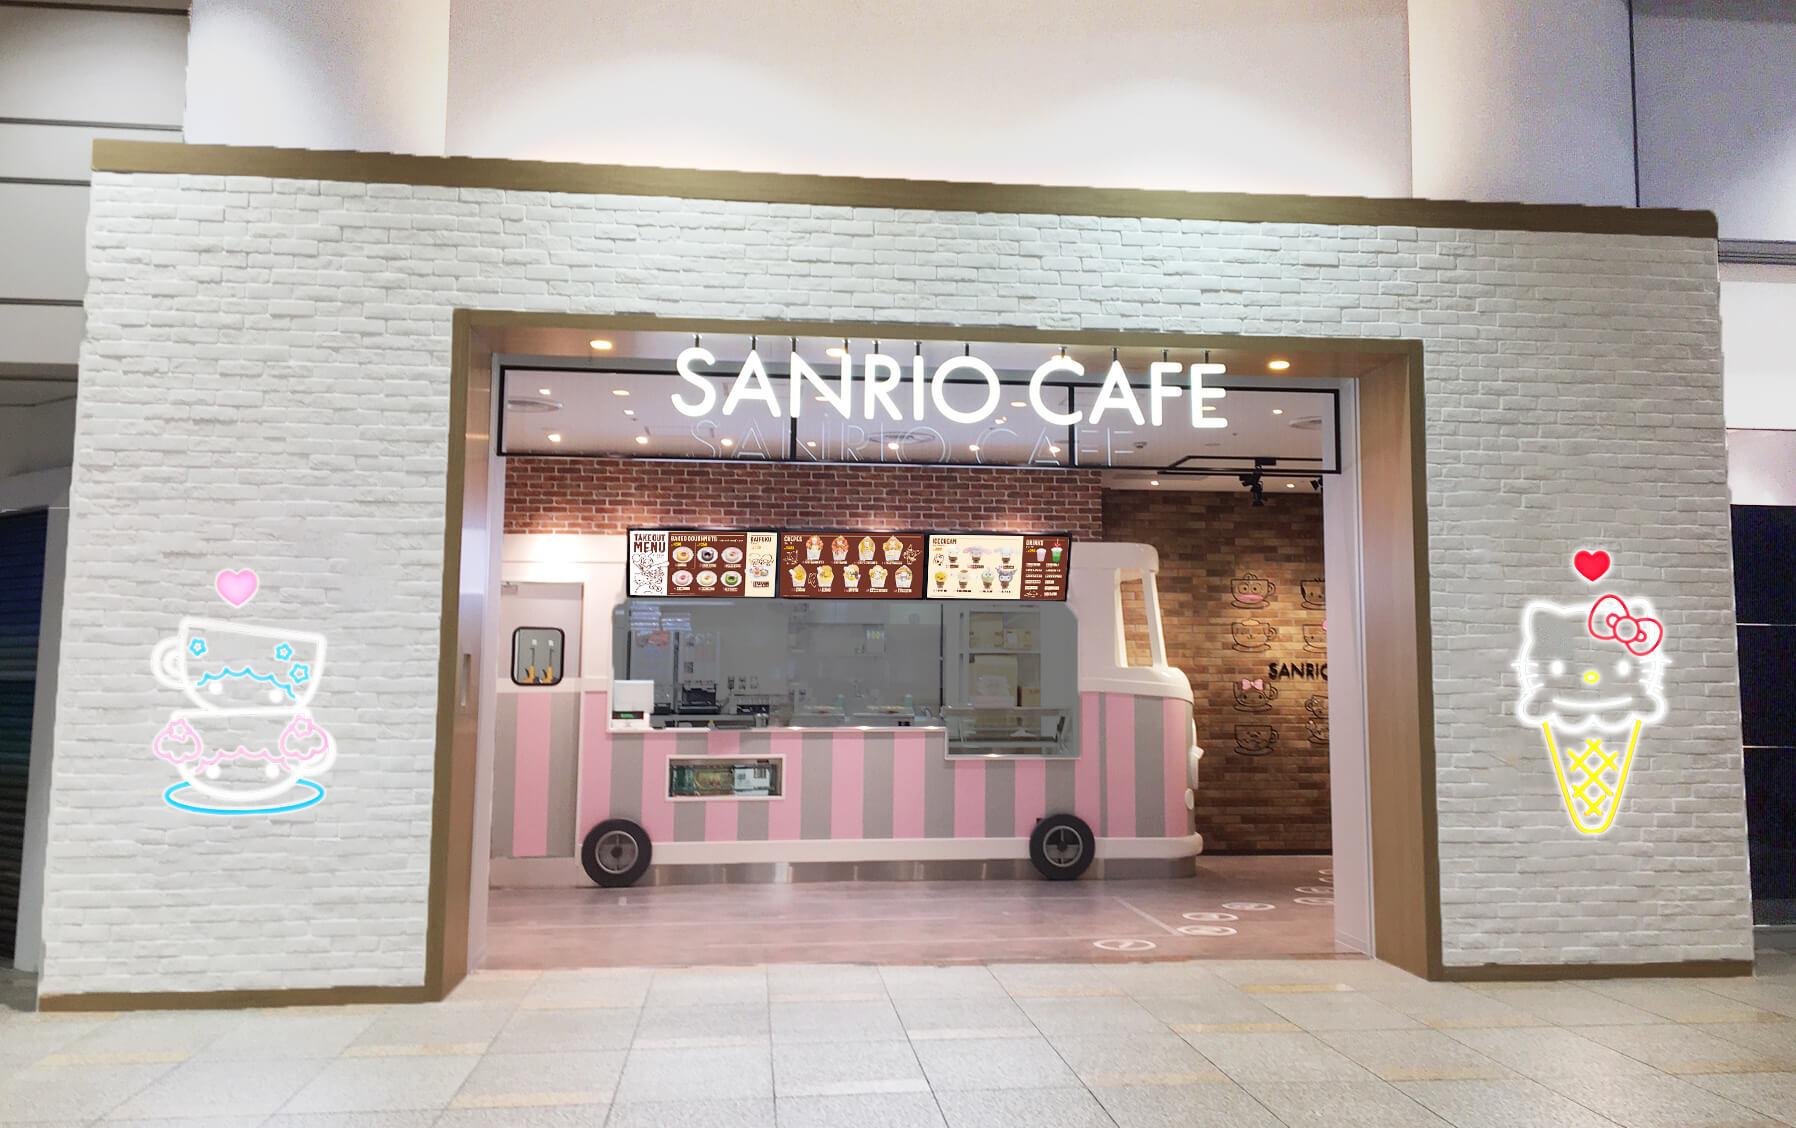 sanrio-cafe-%e3%82%b5%e3%83%b3%e3%83%aa%e3%82%aa%e3%82%ab%e3%83%95%e3%82%a7%e4%b8%89%e9%ba%97%e9%b7%97%e5%92%96%e5%95%a1%e5%bb%b37-2